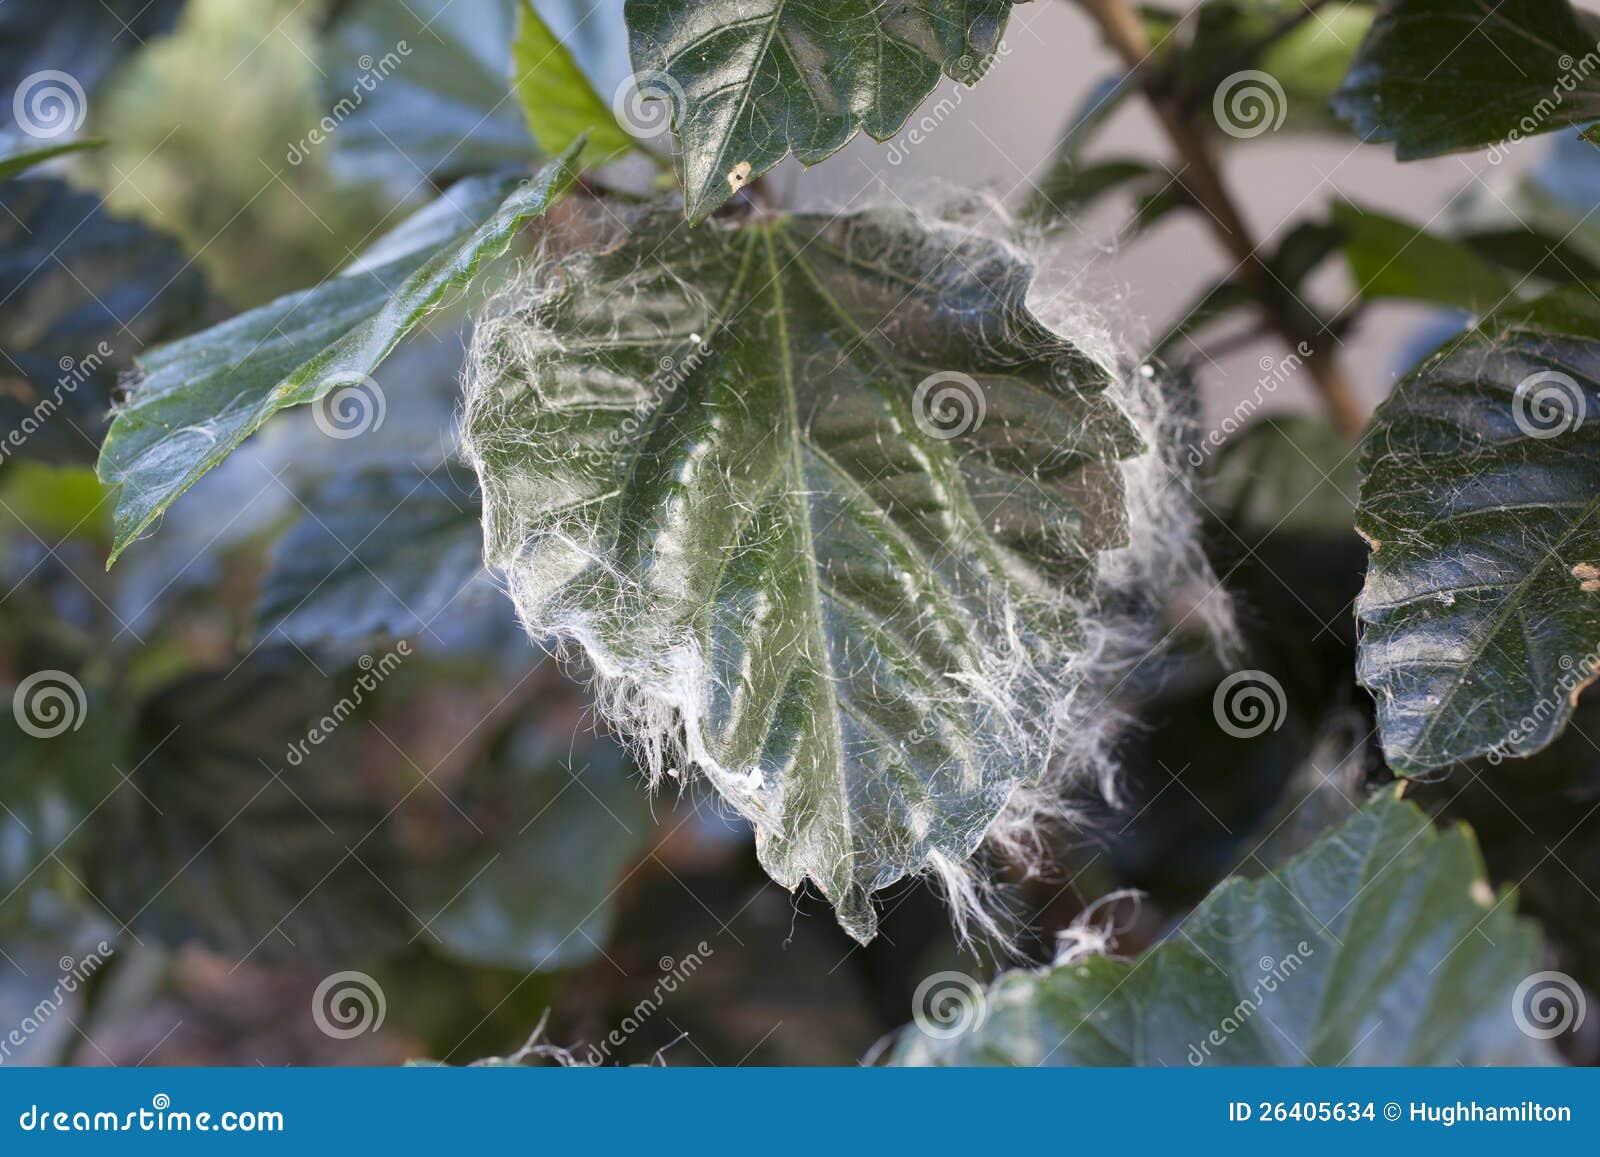 Whitefly Infestation On Hibiscus Stock Images Image